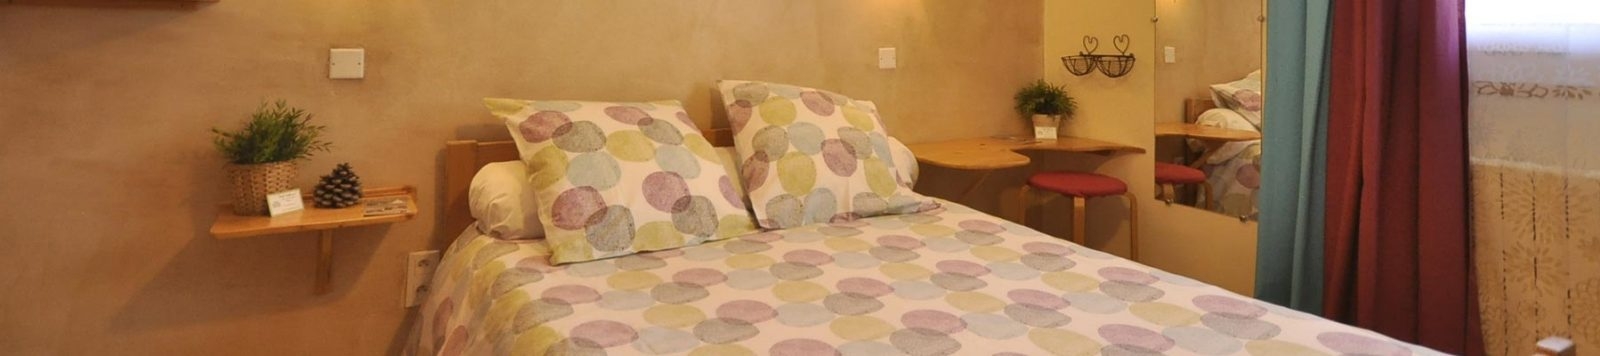 Hotel Chambre double avec salle de bains Vallouise